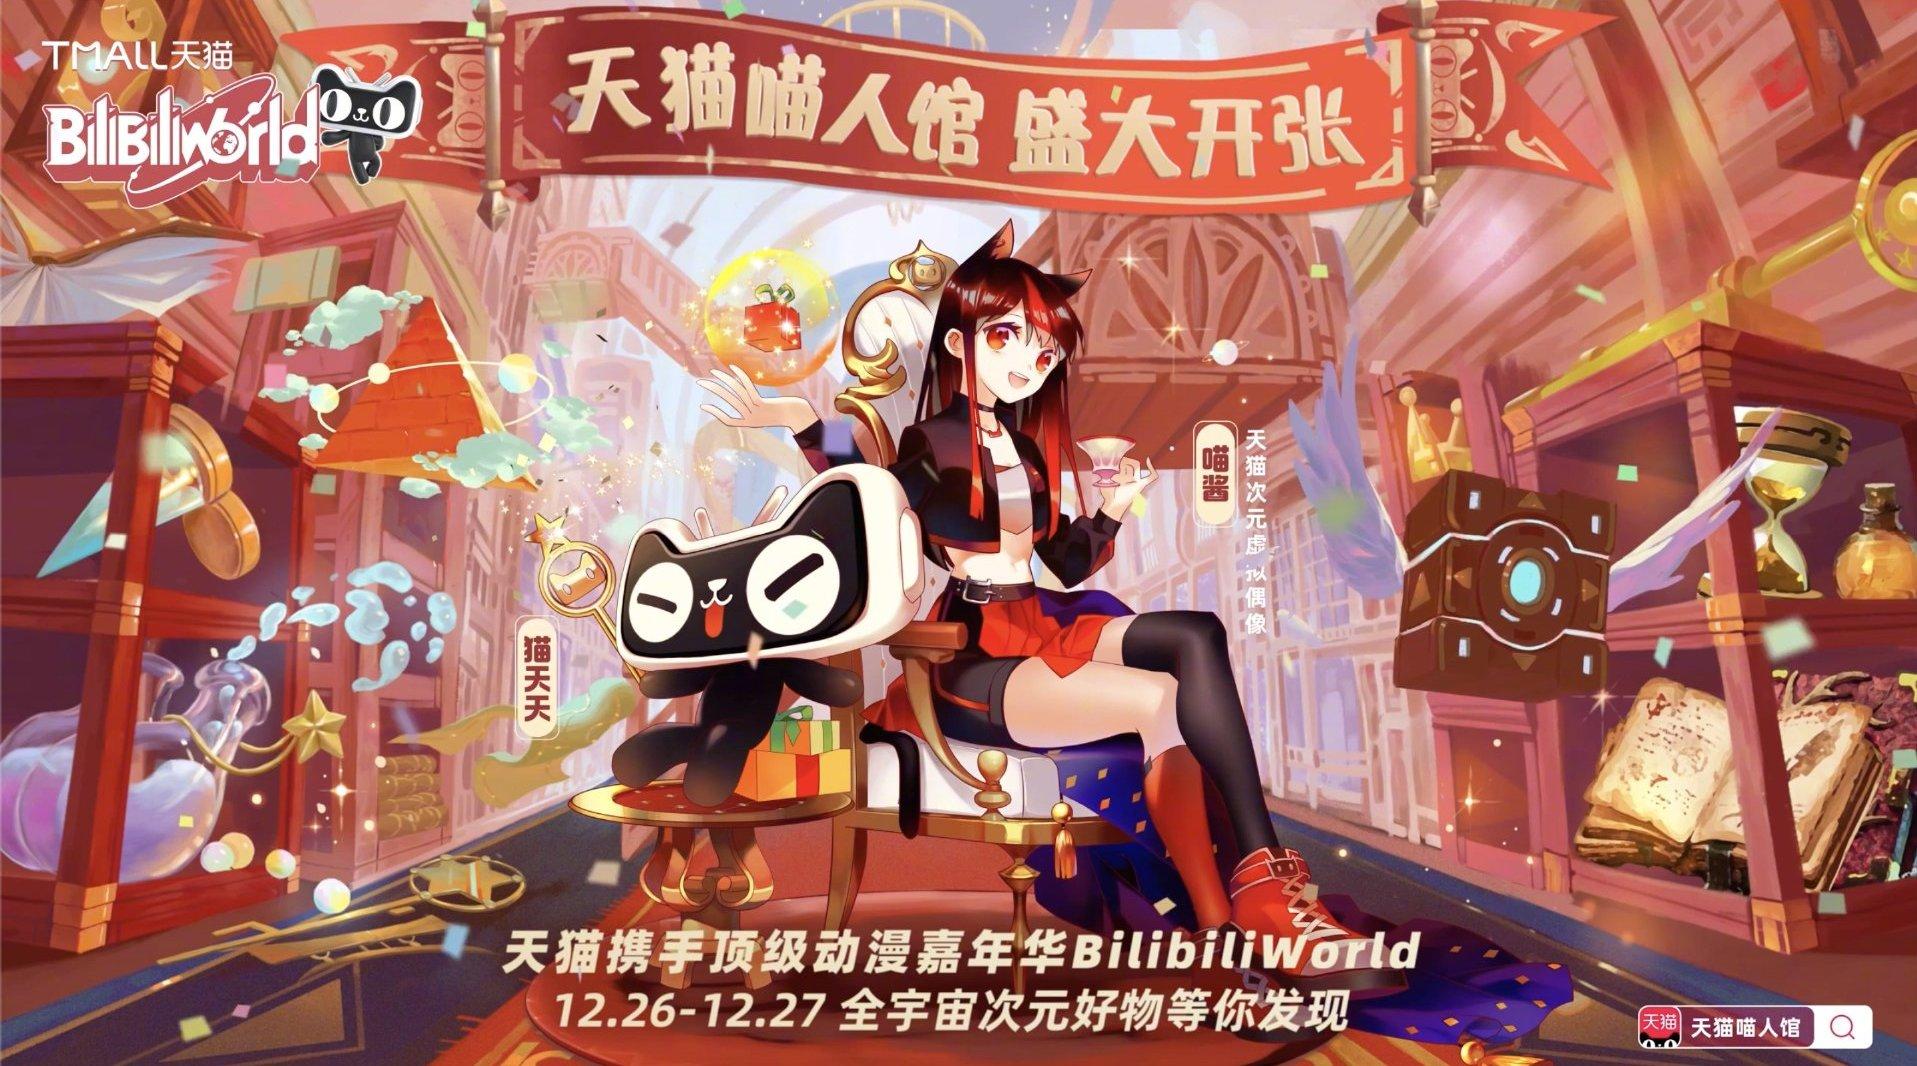 Tmall's virtual charactor Maojiang with Tmall's mascot